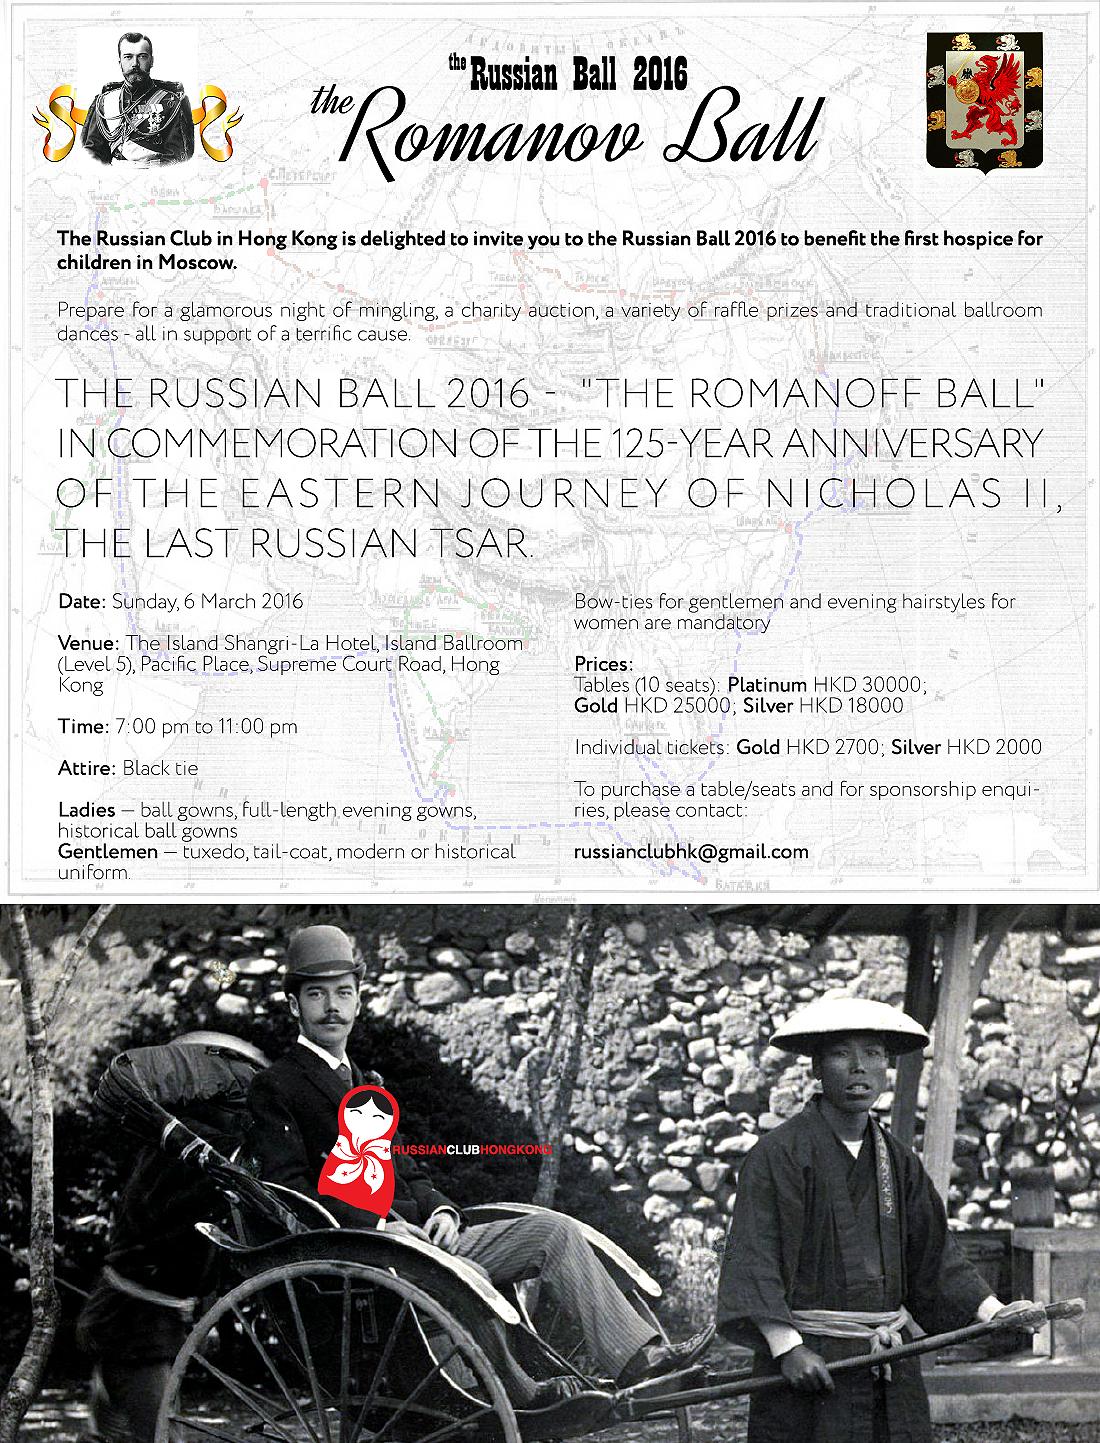 RCHK_RB_Romanov_03_ENG_o